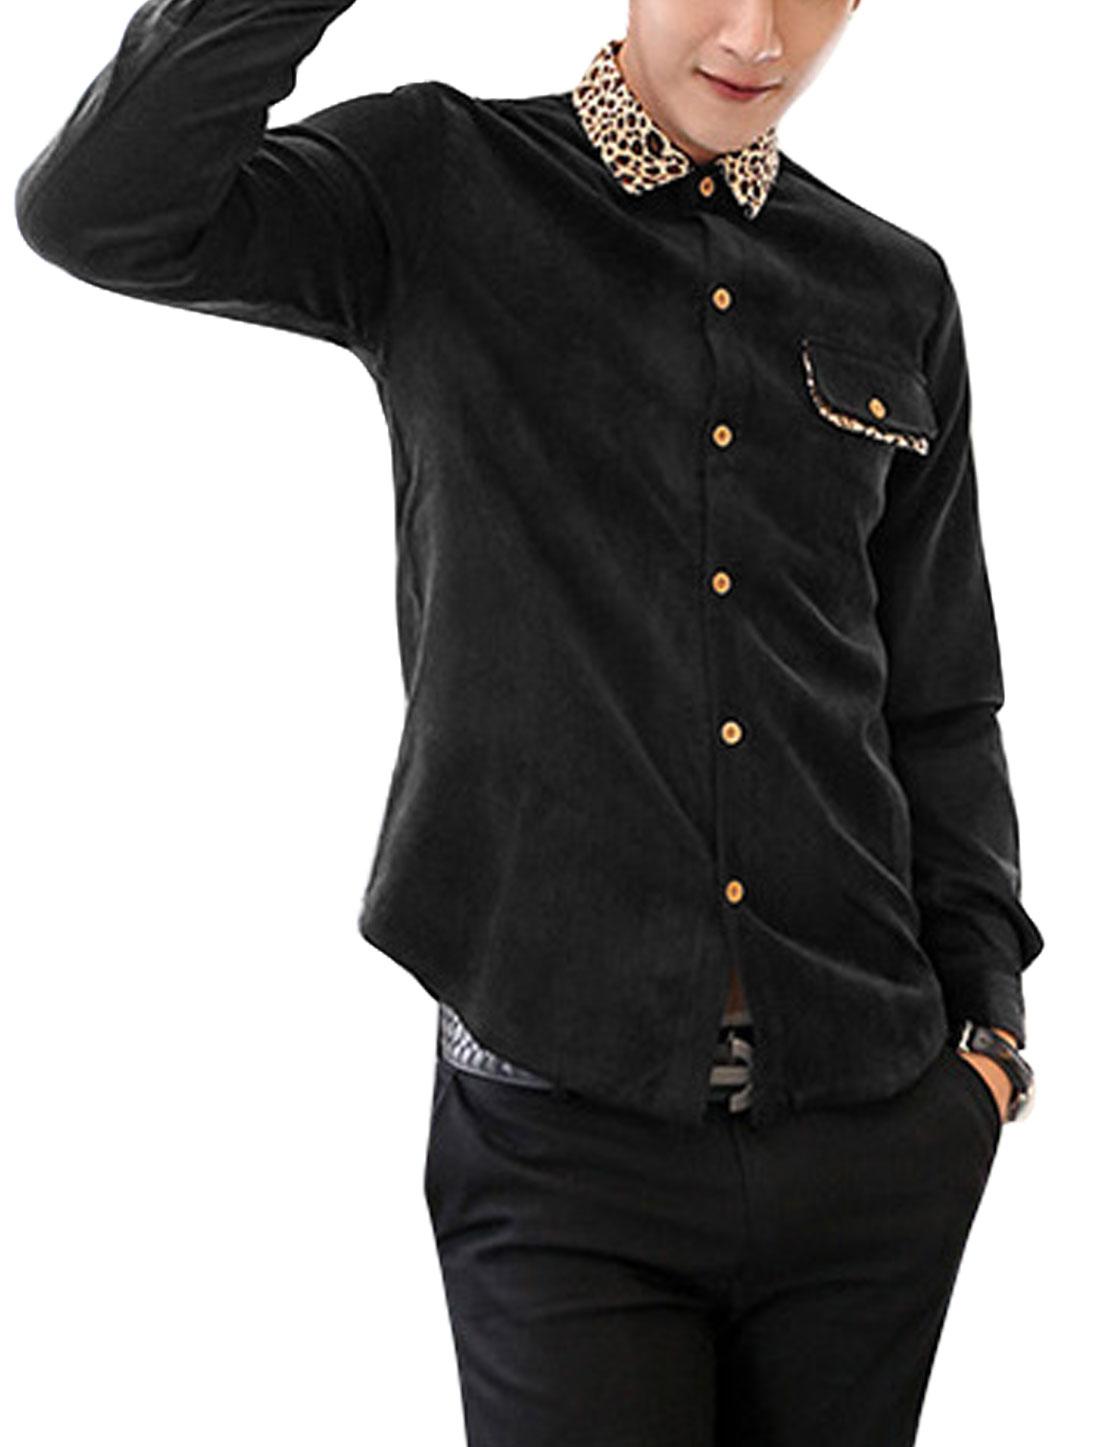 Men Point Collar Leopard Detail Casual Corduroy Shirt Black M